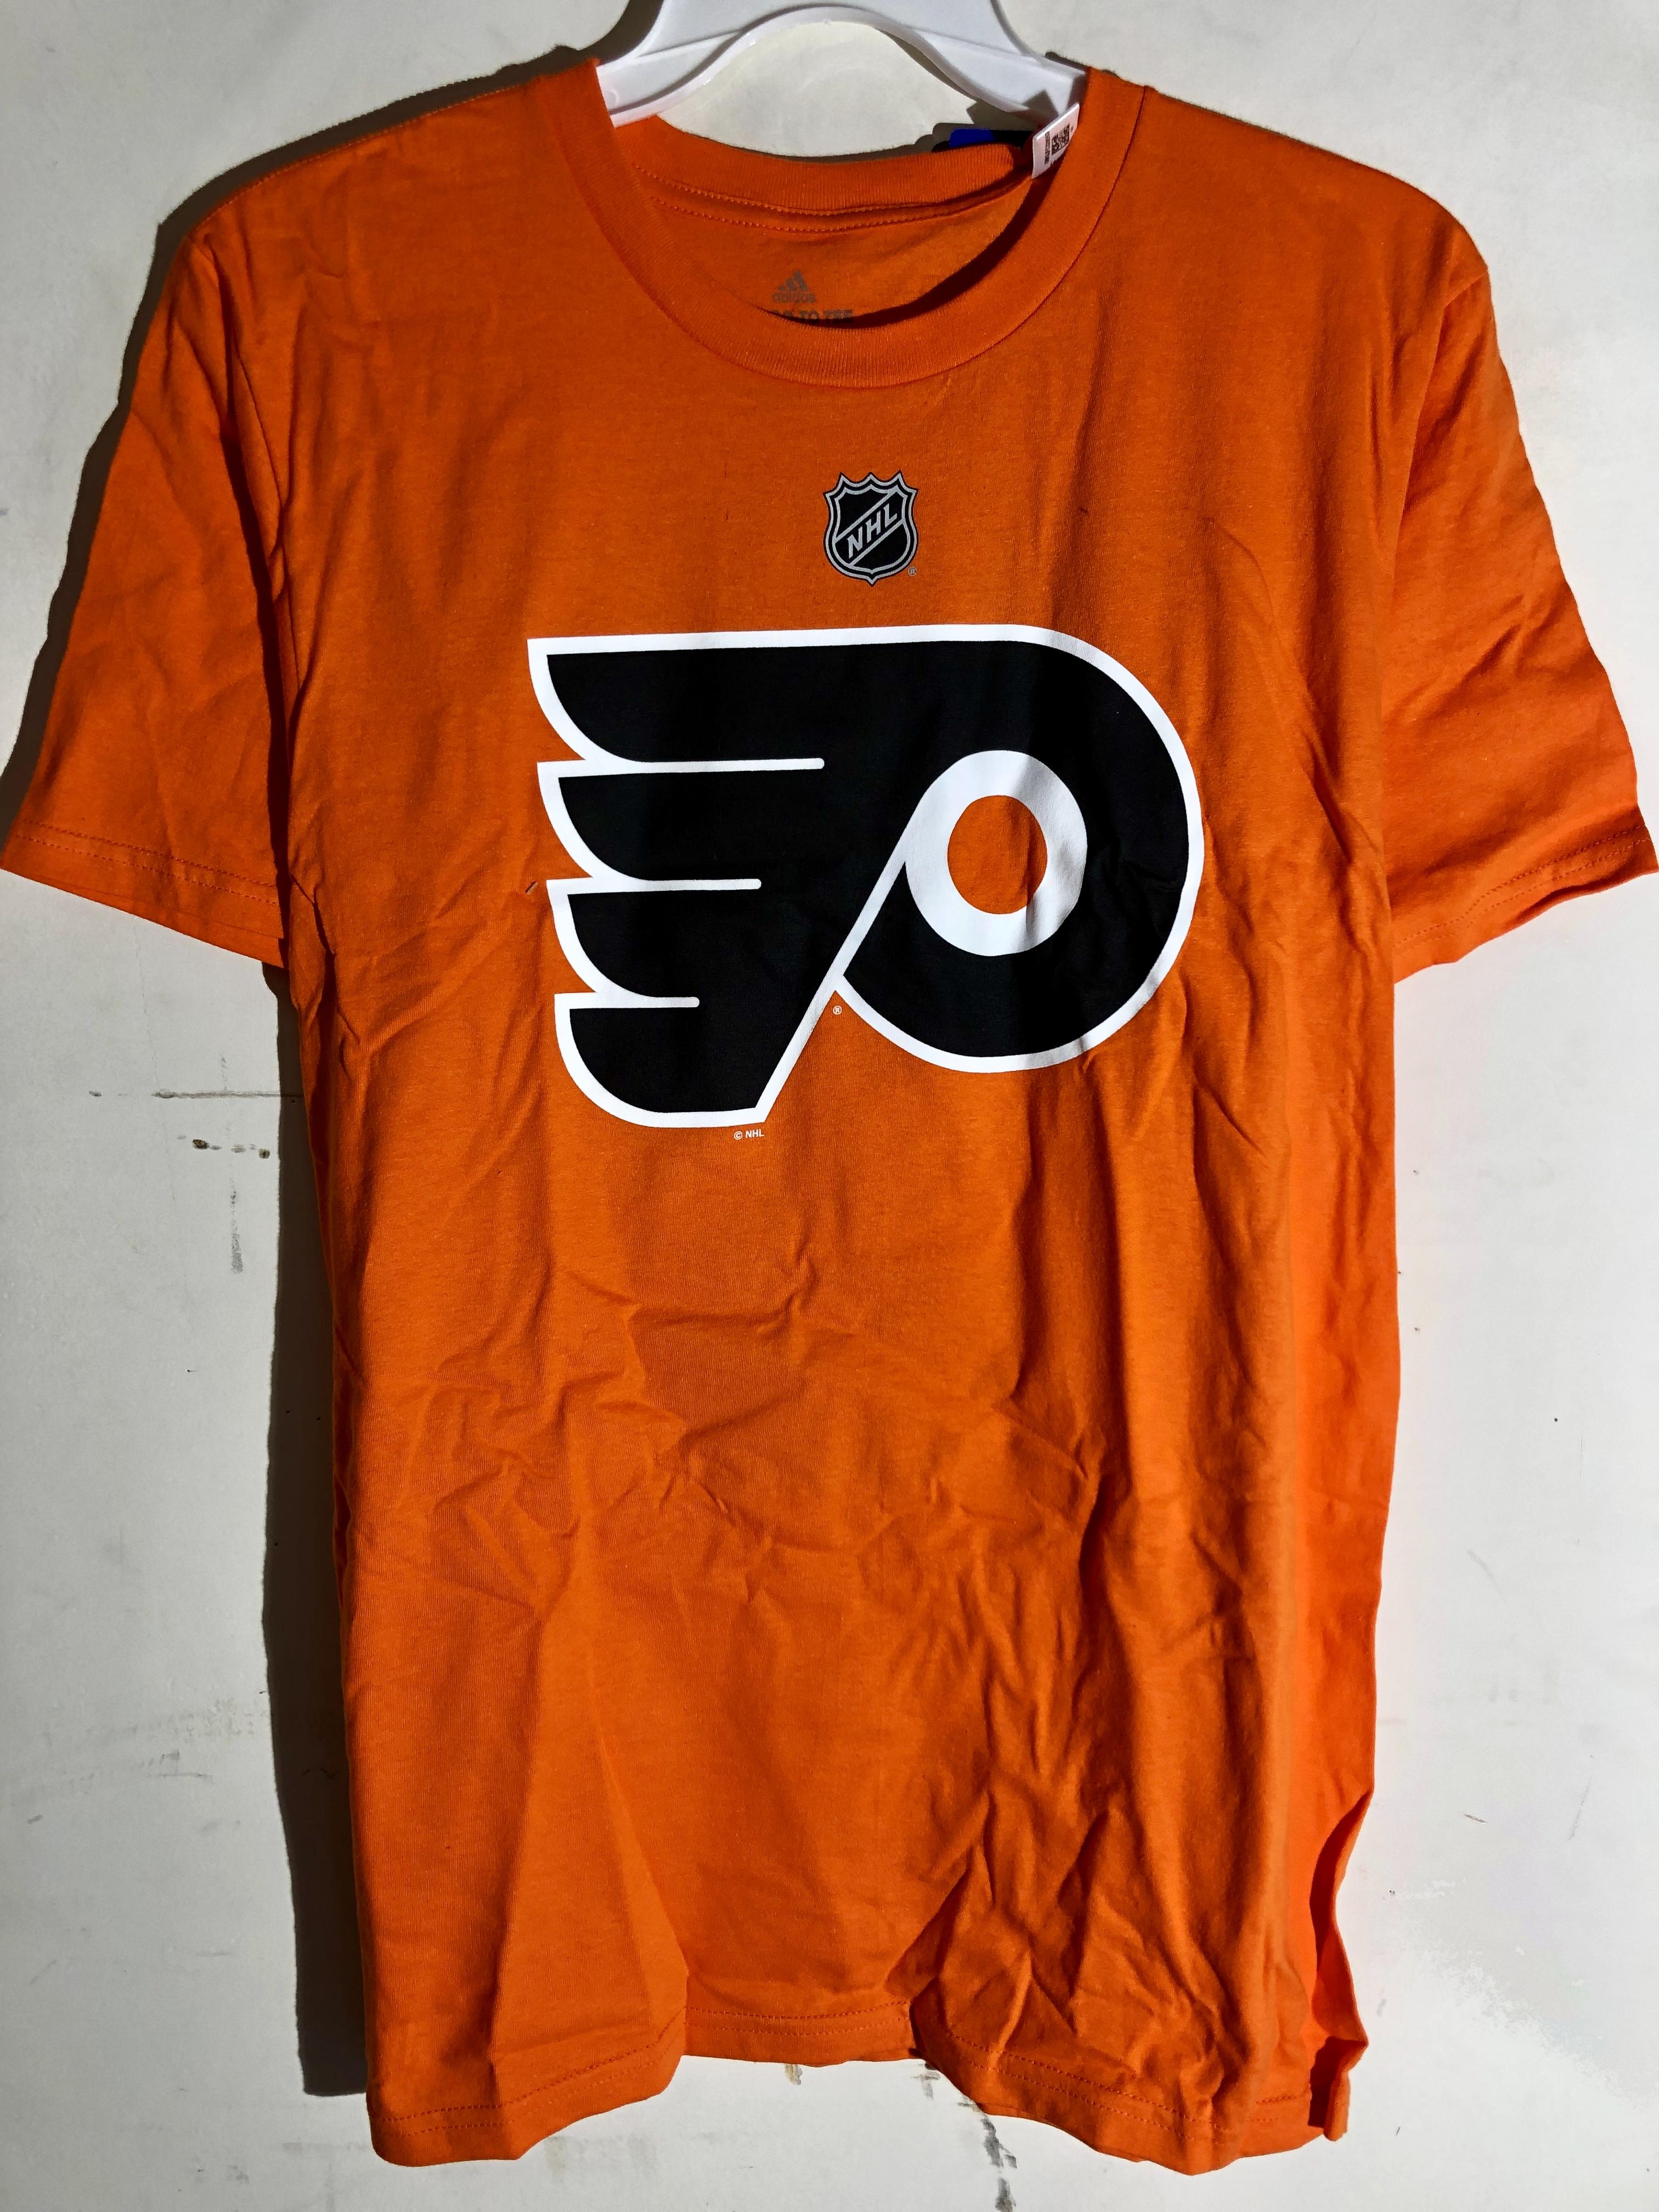 best website 979c1 ae999 Details about adidas NHL T-Shirt Philadelphia Flyers Ivan Provorov Orange  sz M